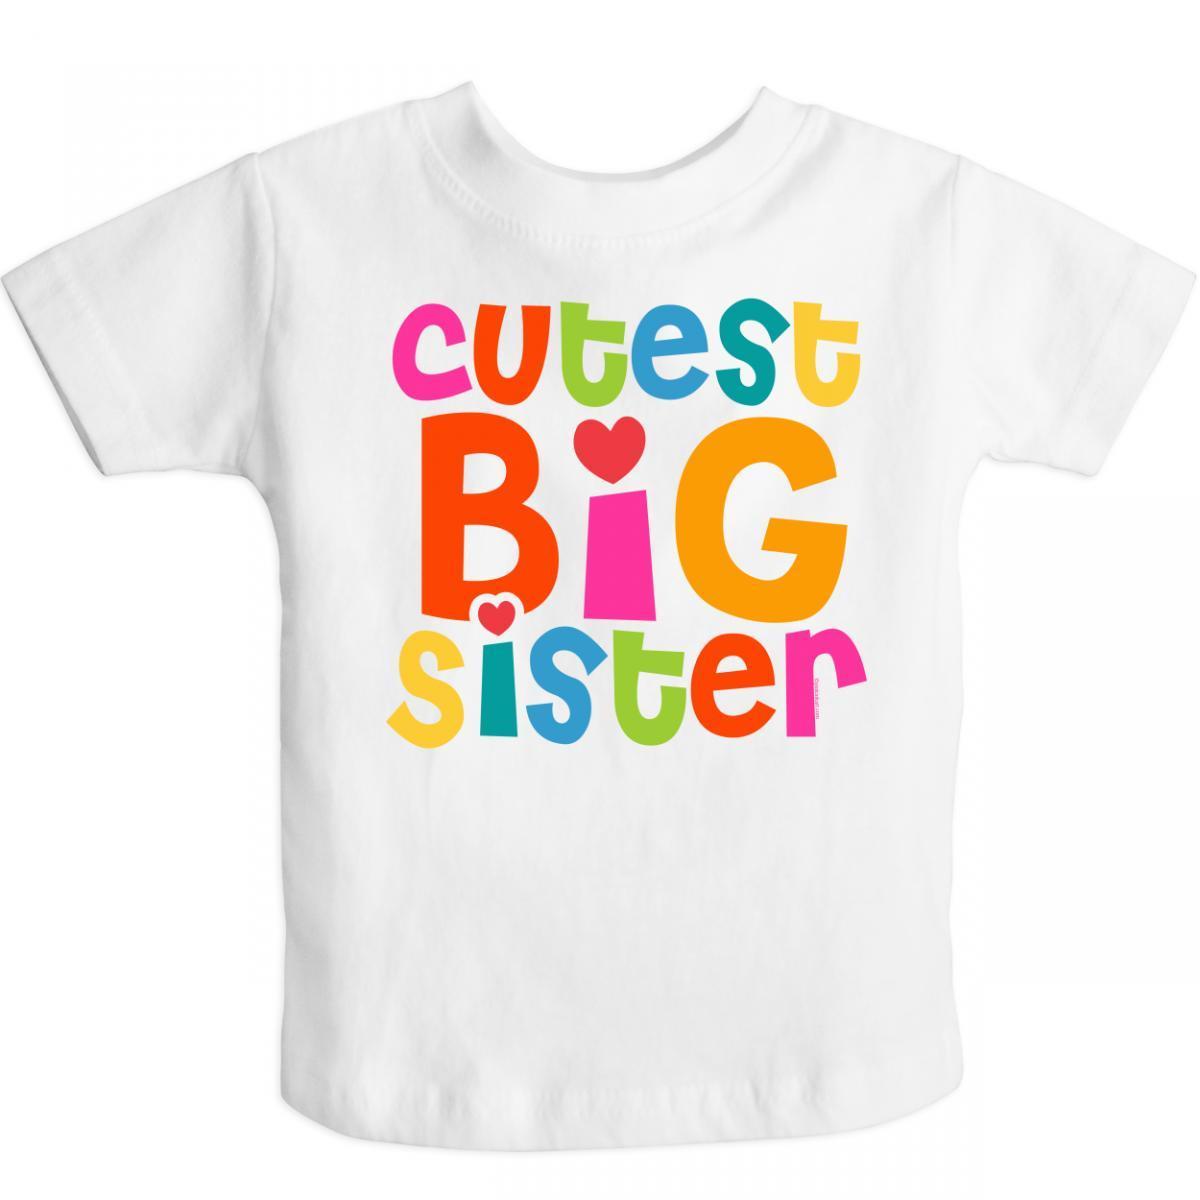 Inktastic Cutest Big Sister Toddler T-Shirt | eBay